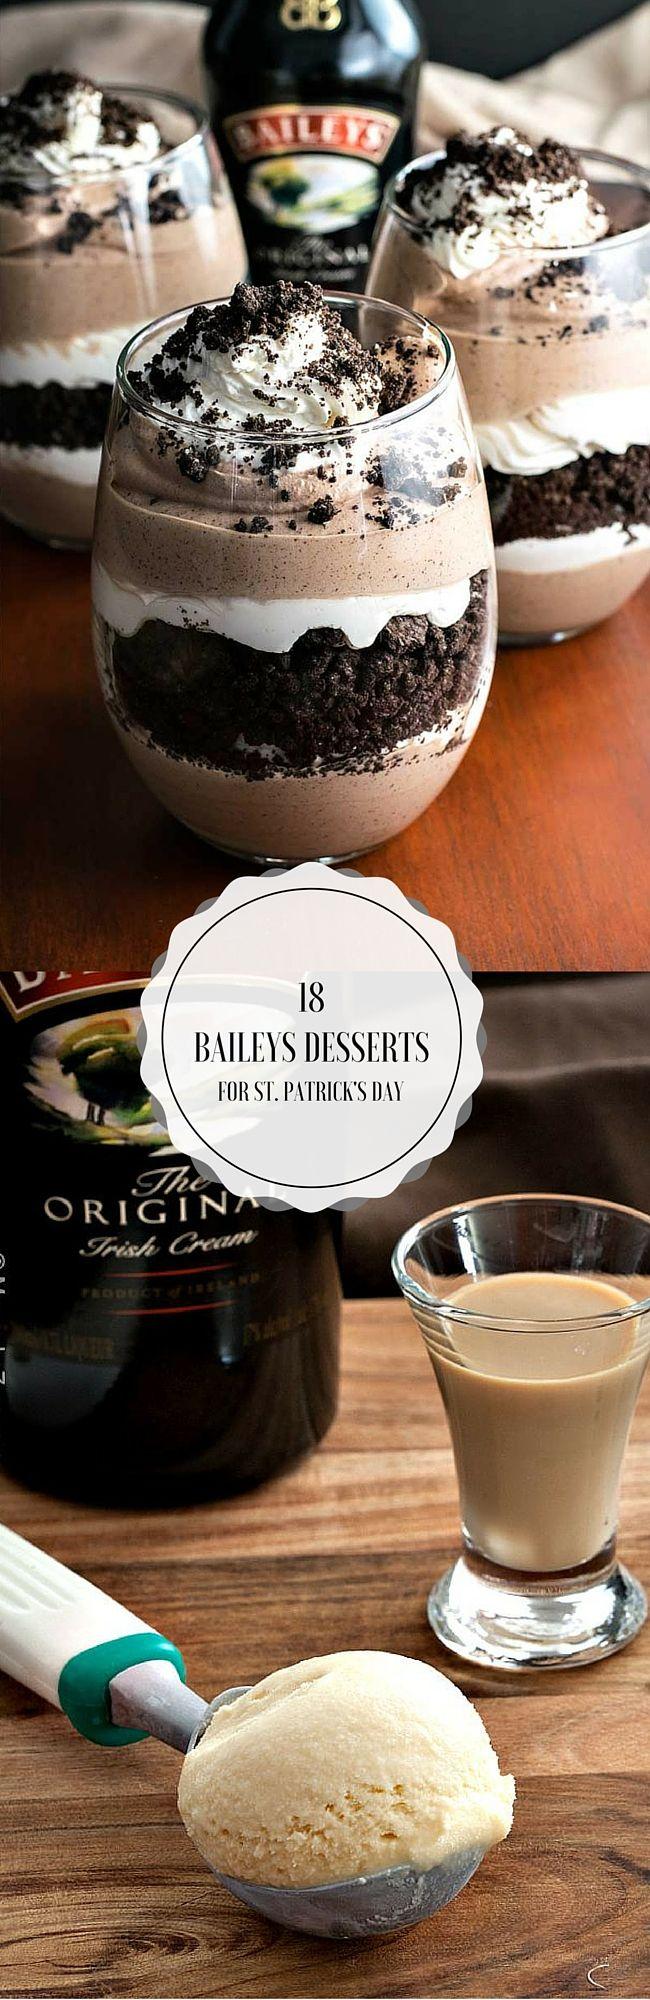 18 BAILEYS DESSERTS